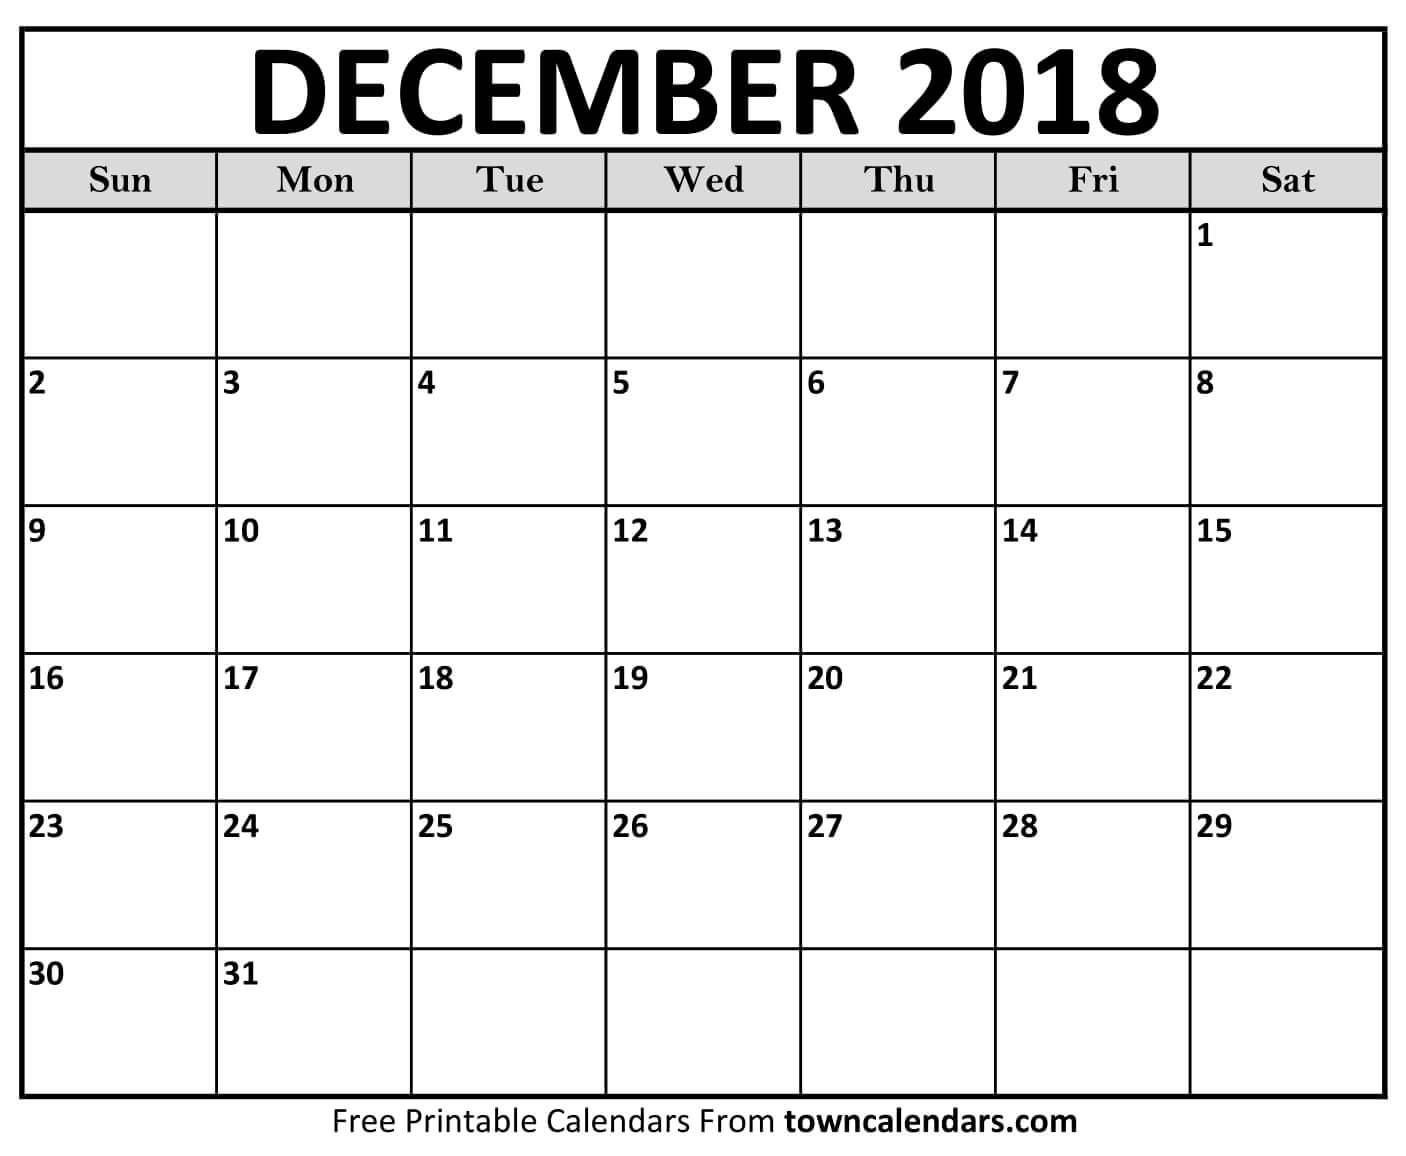 Printable 2018 December Calendar Template - Printable Calendar 2019 with regard to Blank Calendar Template December